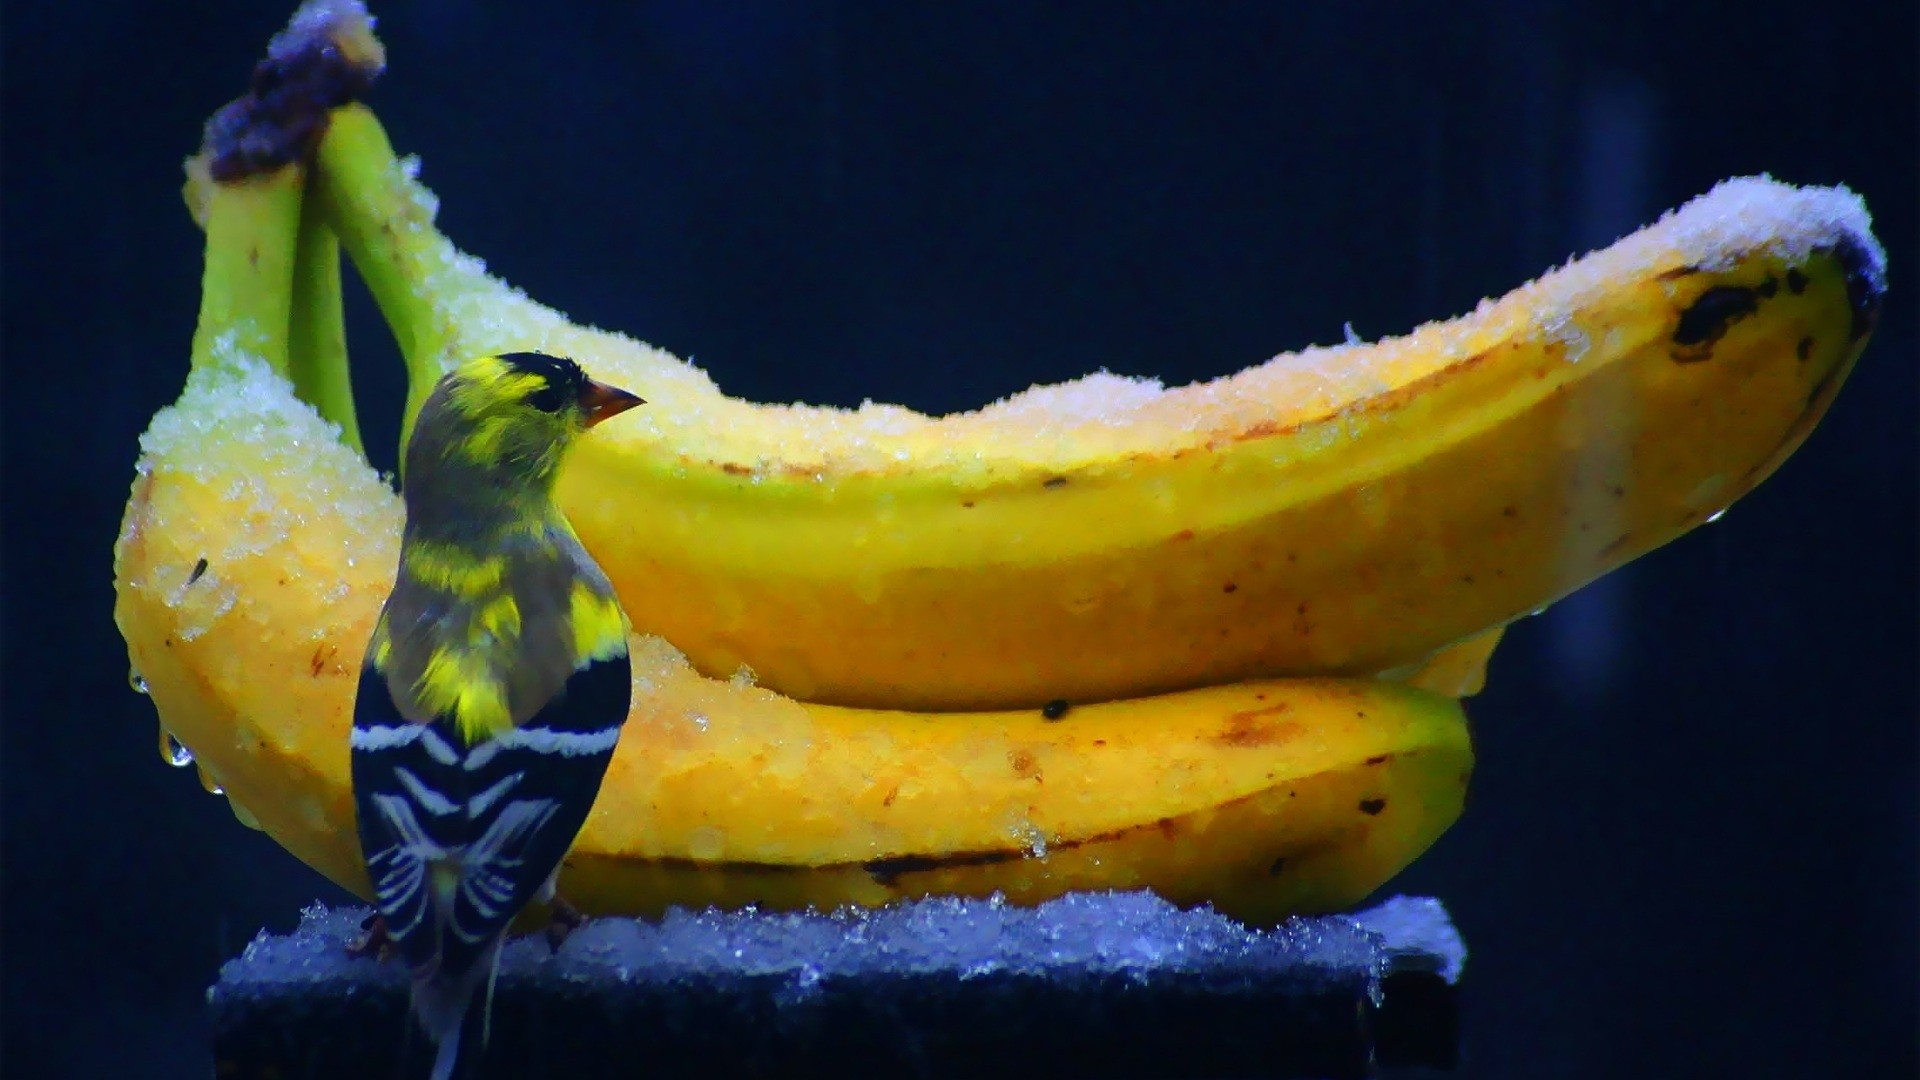 Banana Pic